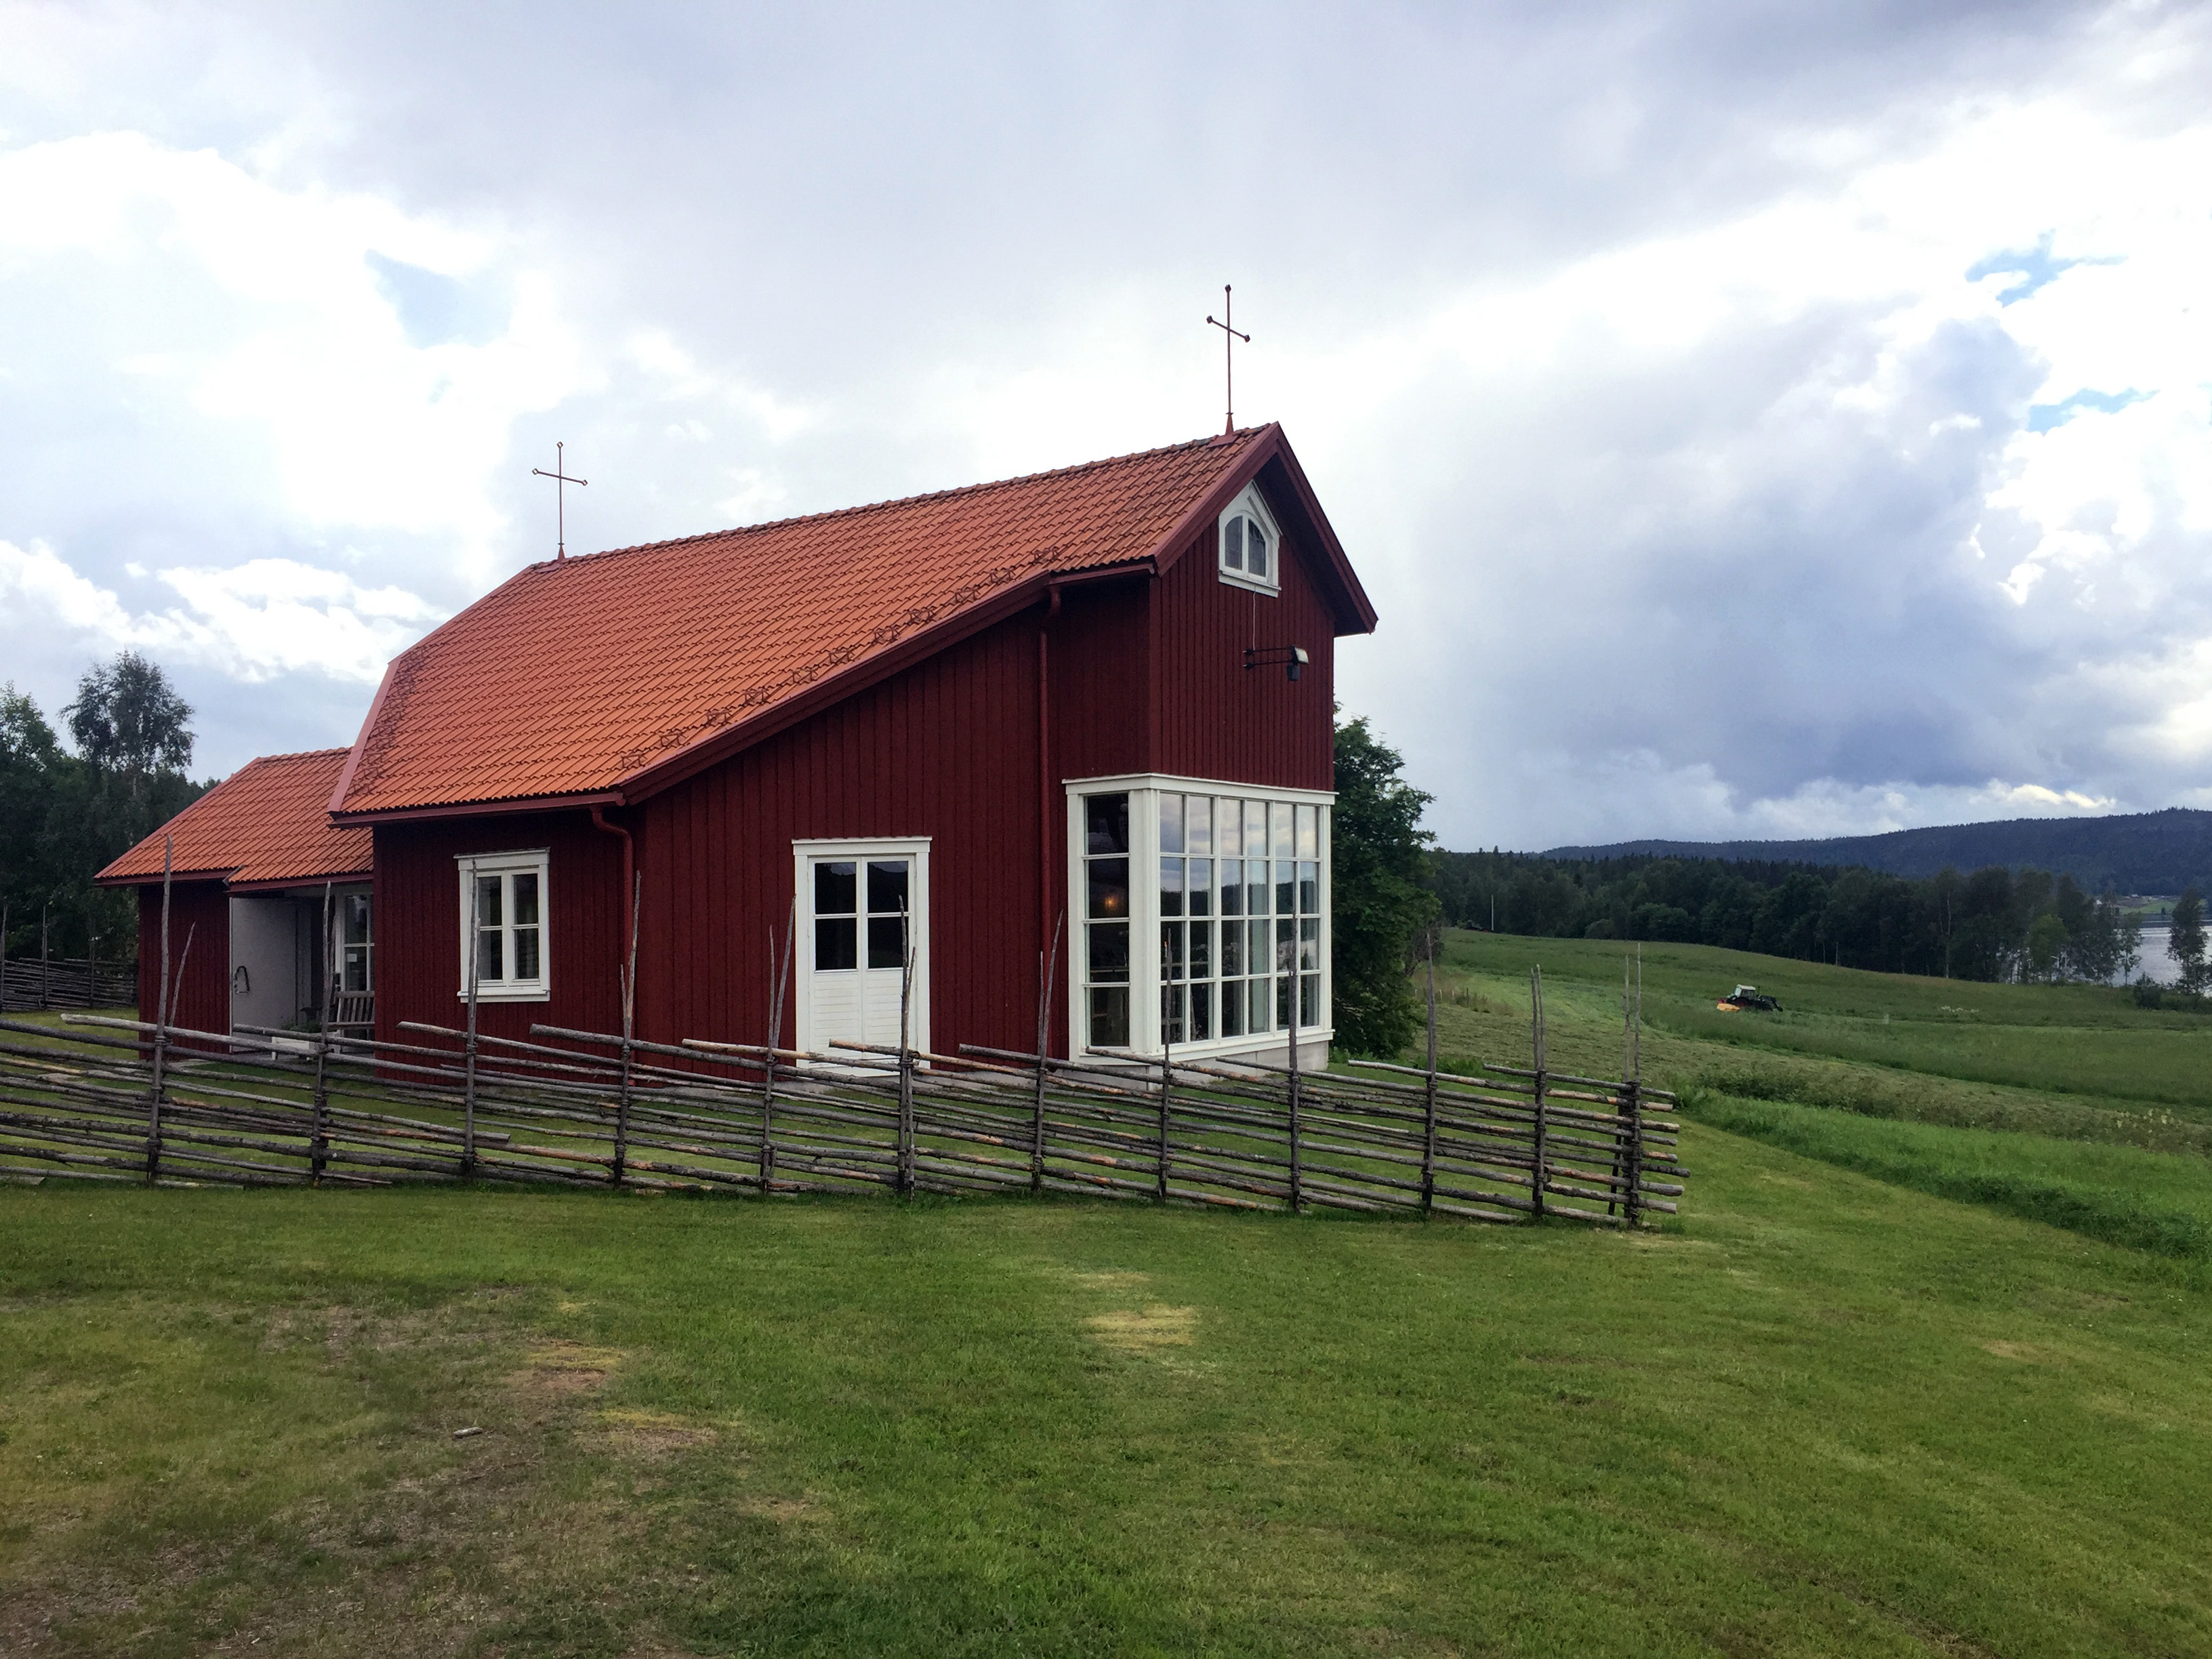 Stora rummet, Heleneborg, Tavelsj, Ume - Barns - Airbnb